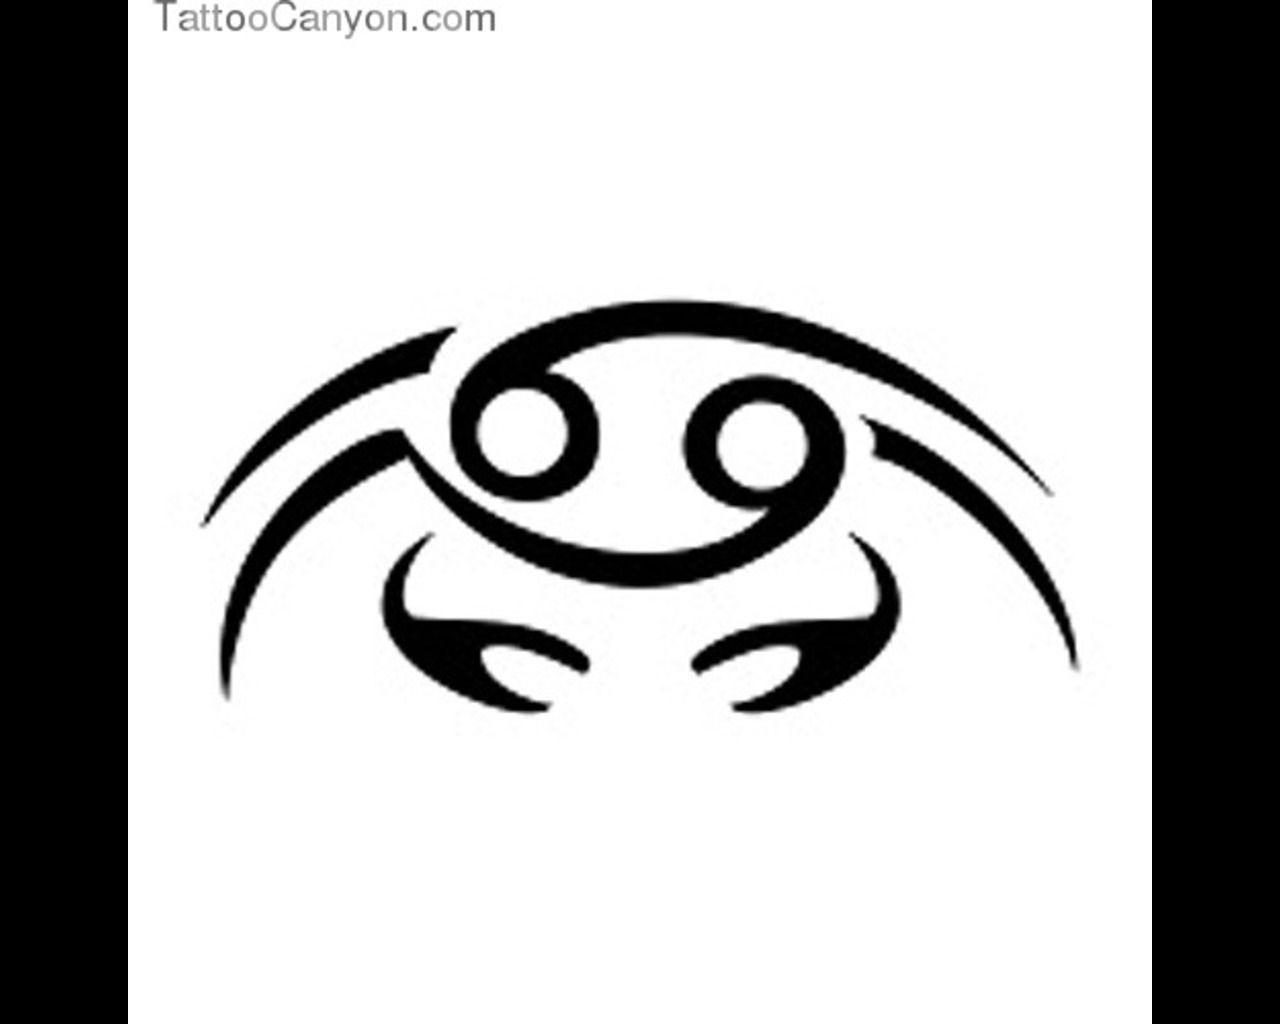 Sign tattoo designs - Photos 929 Cancer Zodiac Sign Tattoo Tattoo Design 1280x1024 Jpg